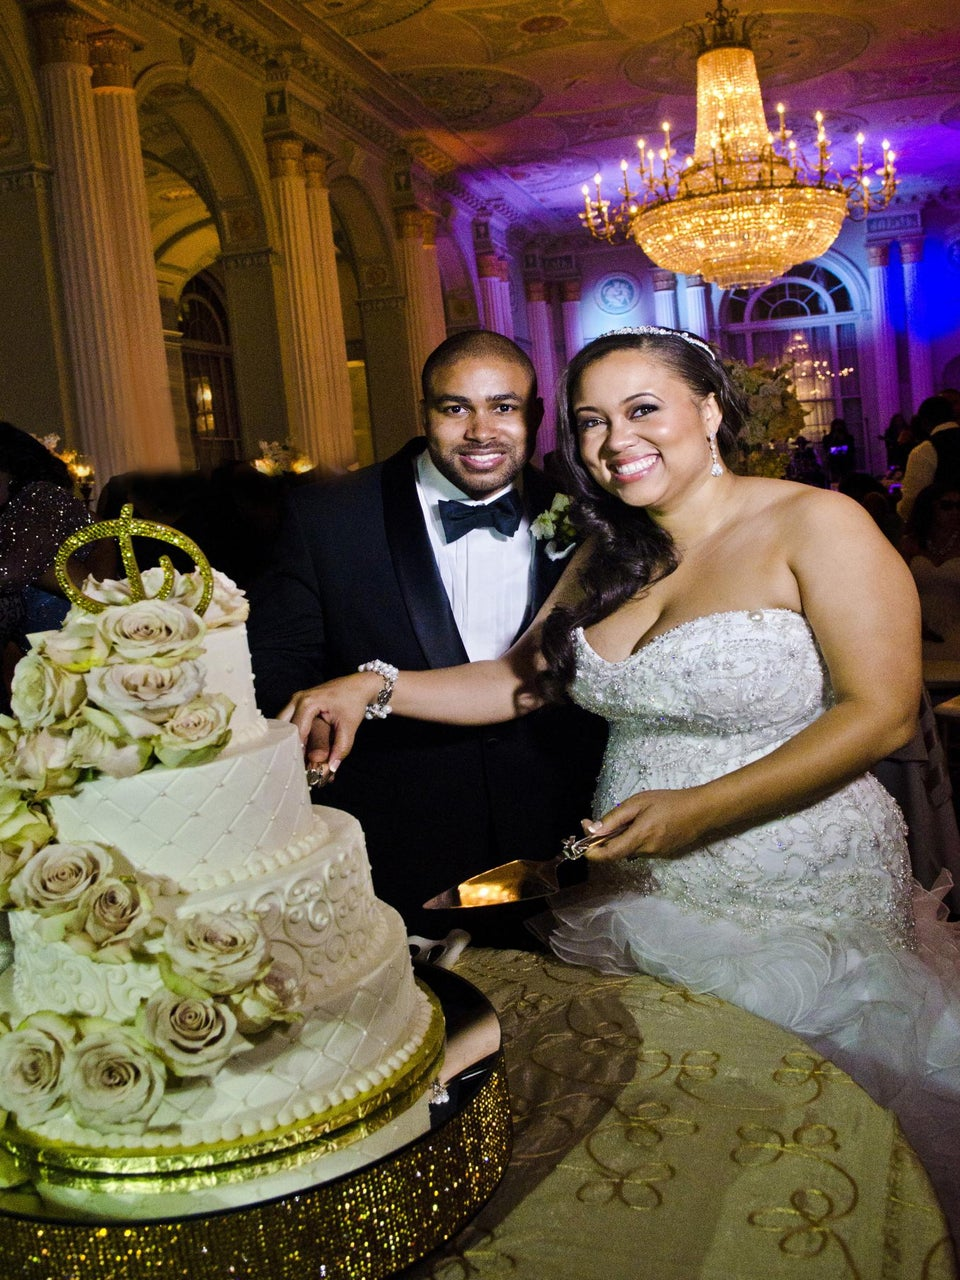 Bridal Bliss: Alexandra and Michael's Atlanta Wedding